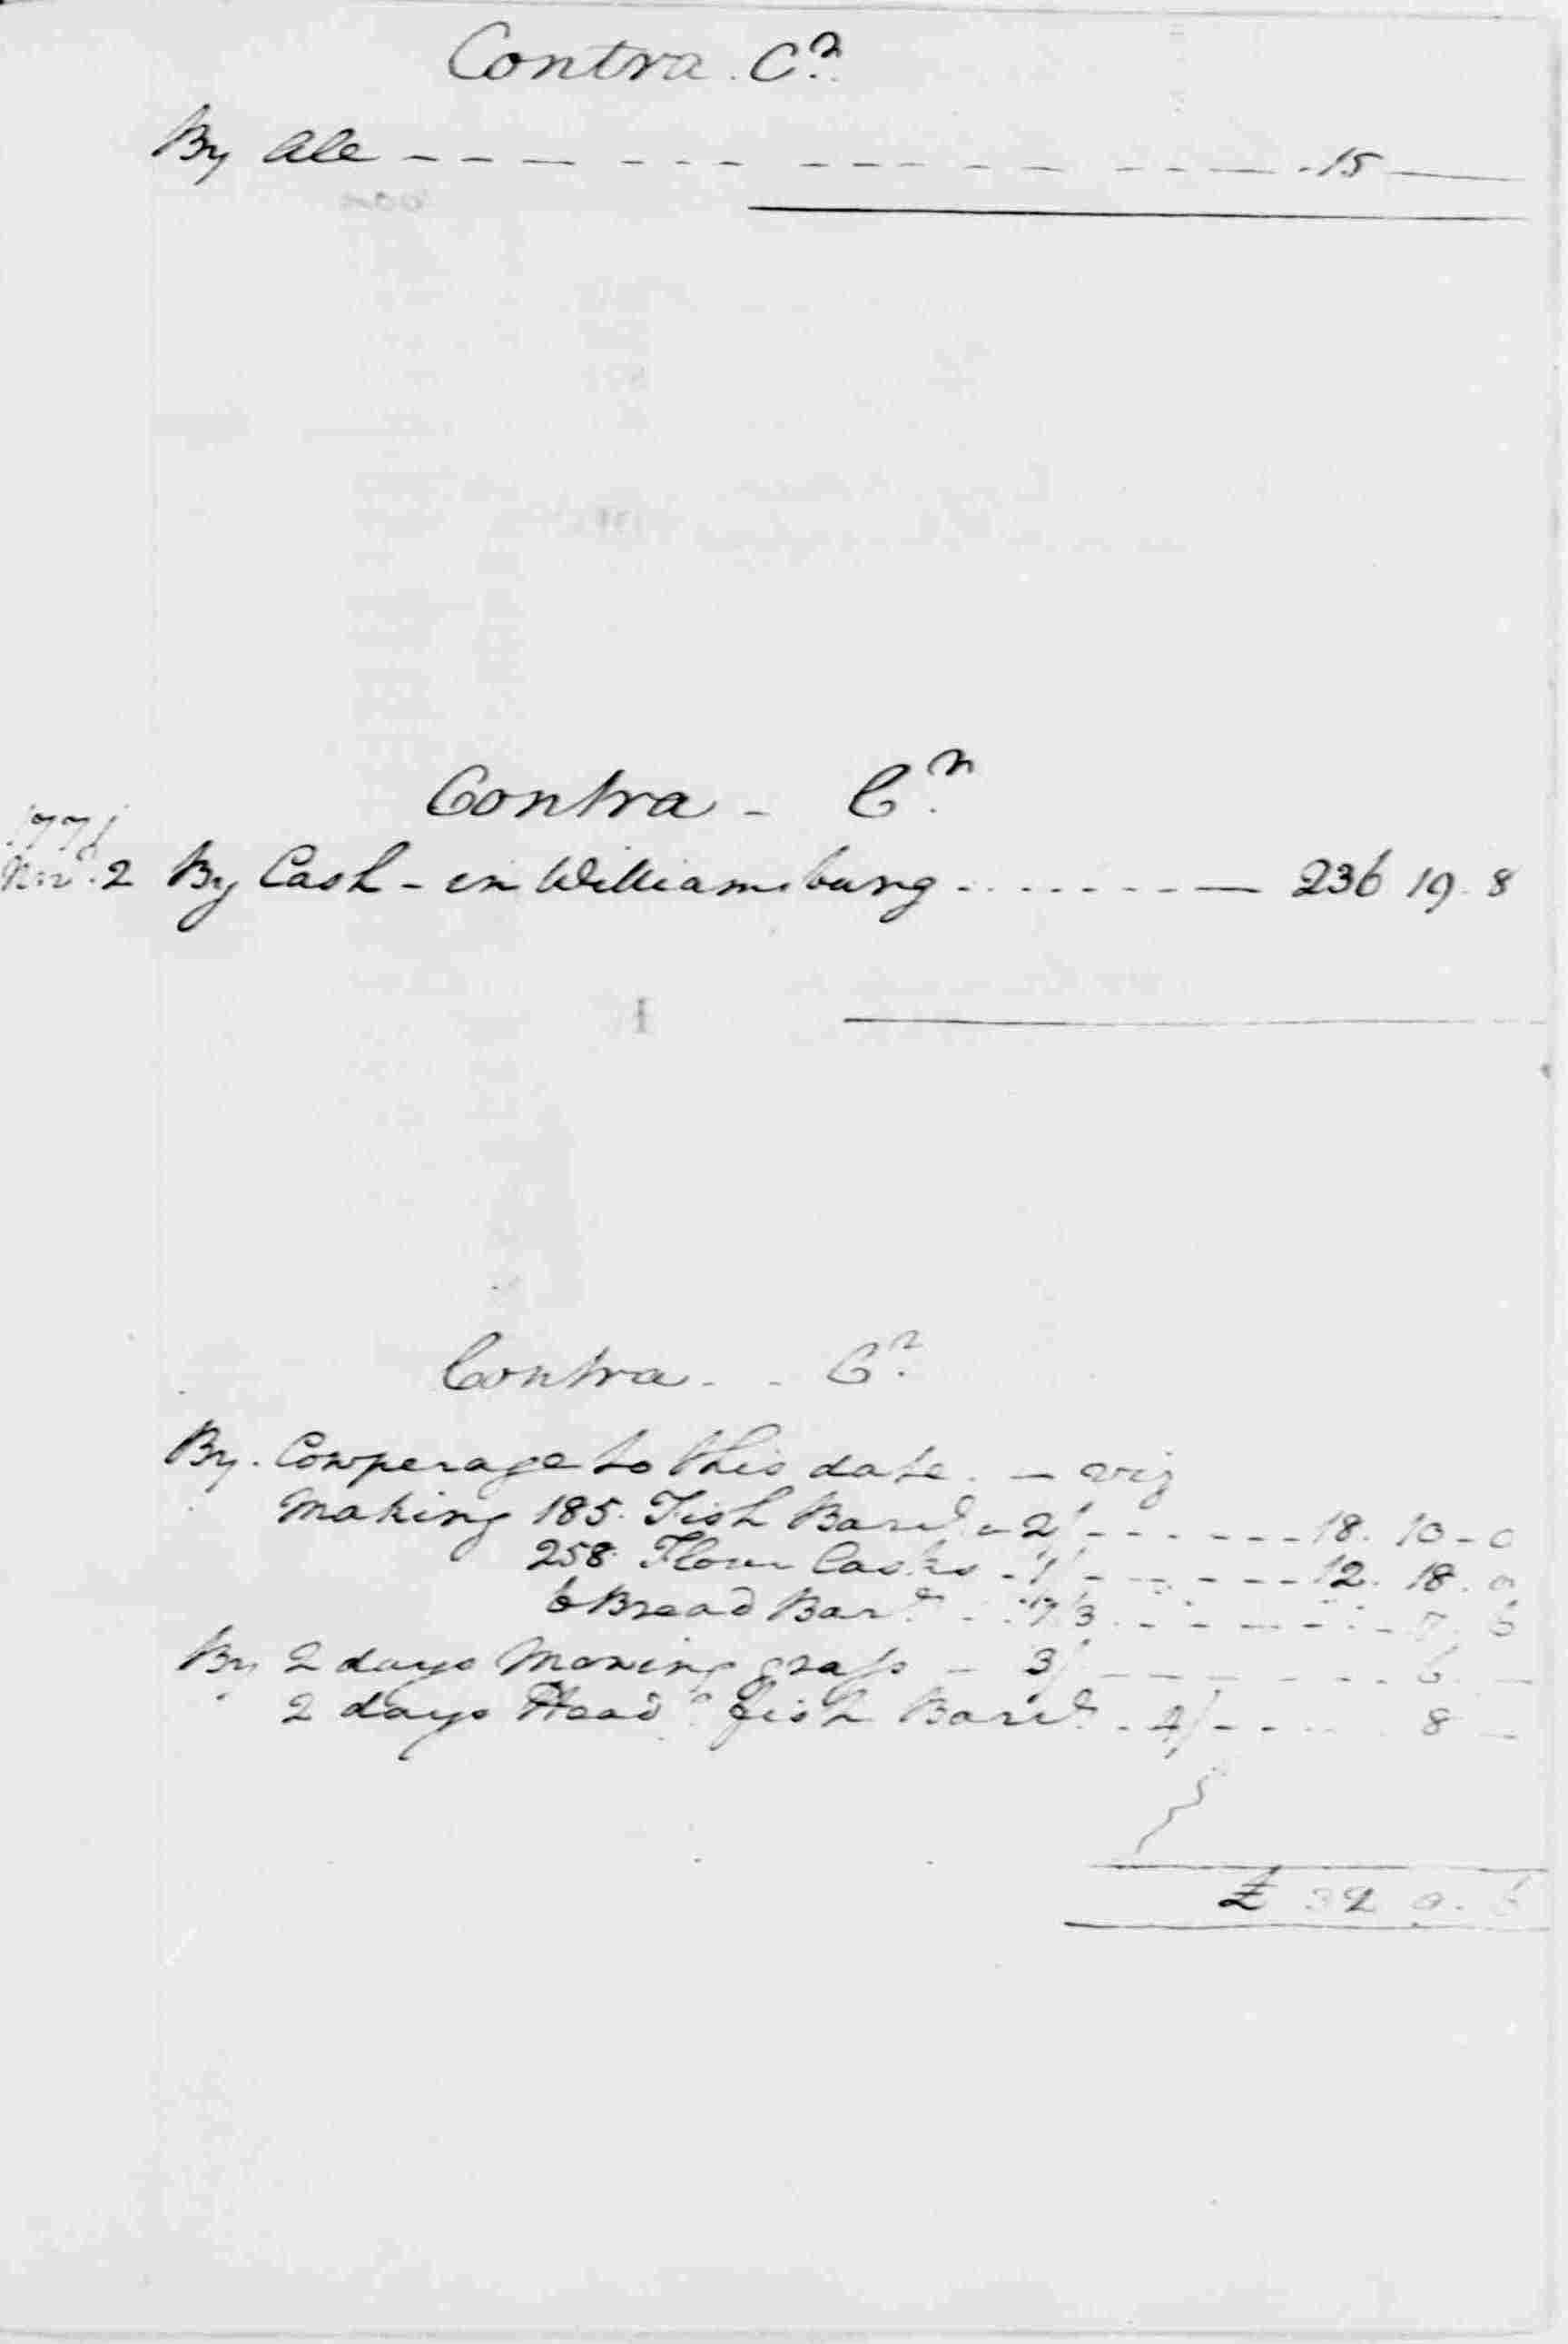 Ledger A, folio 338, right side